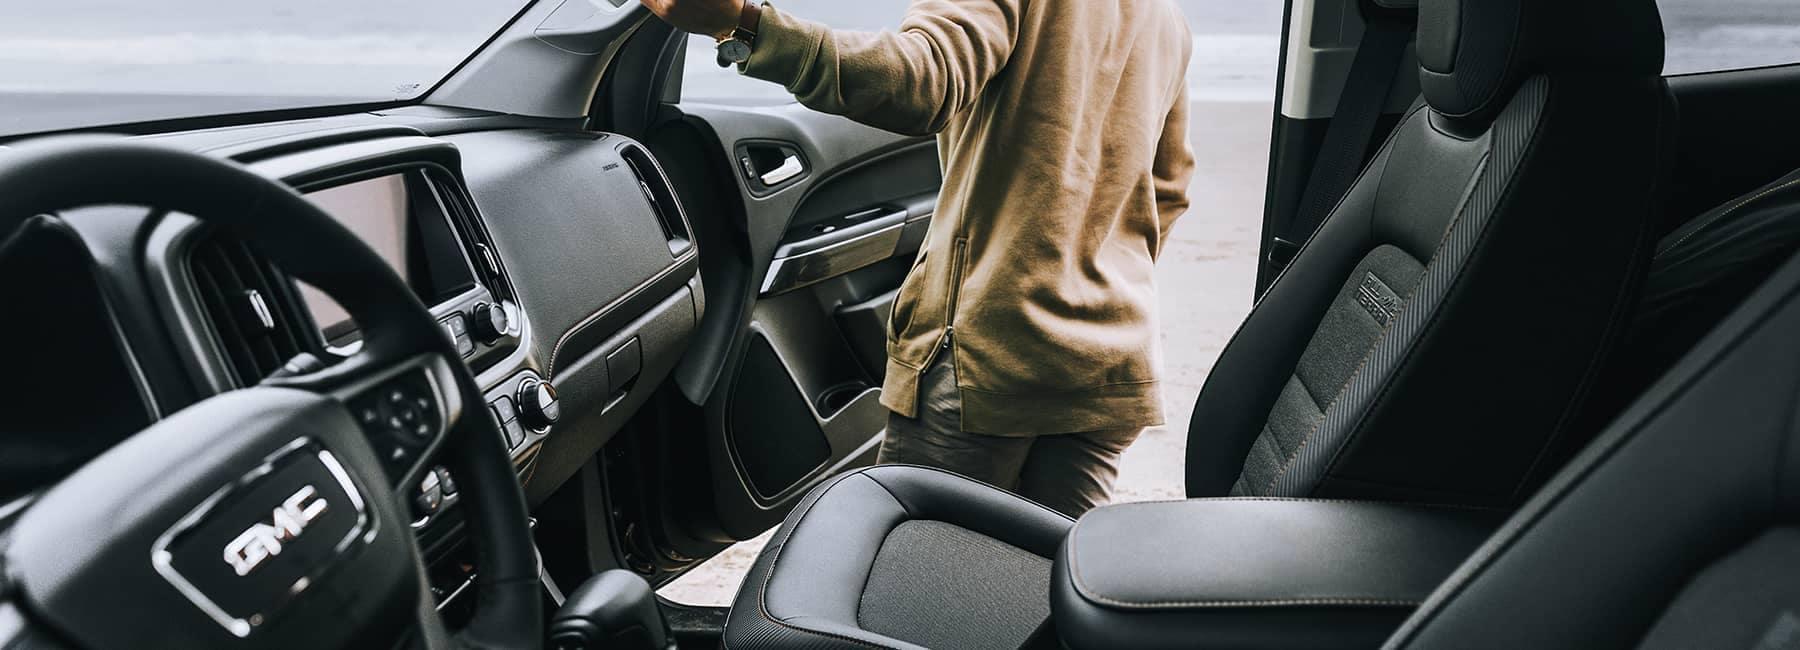 2020 GMC Terrain Interior Front Seat